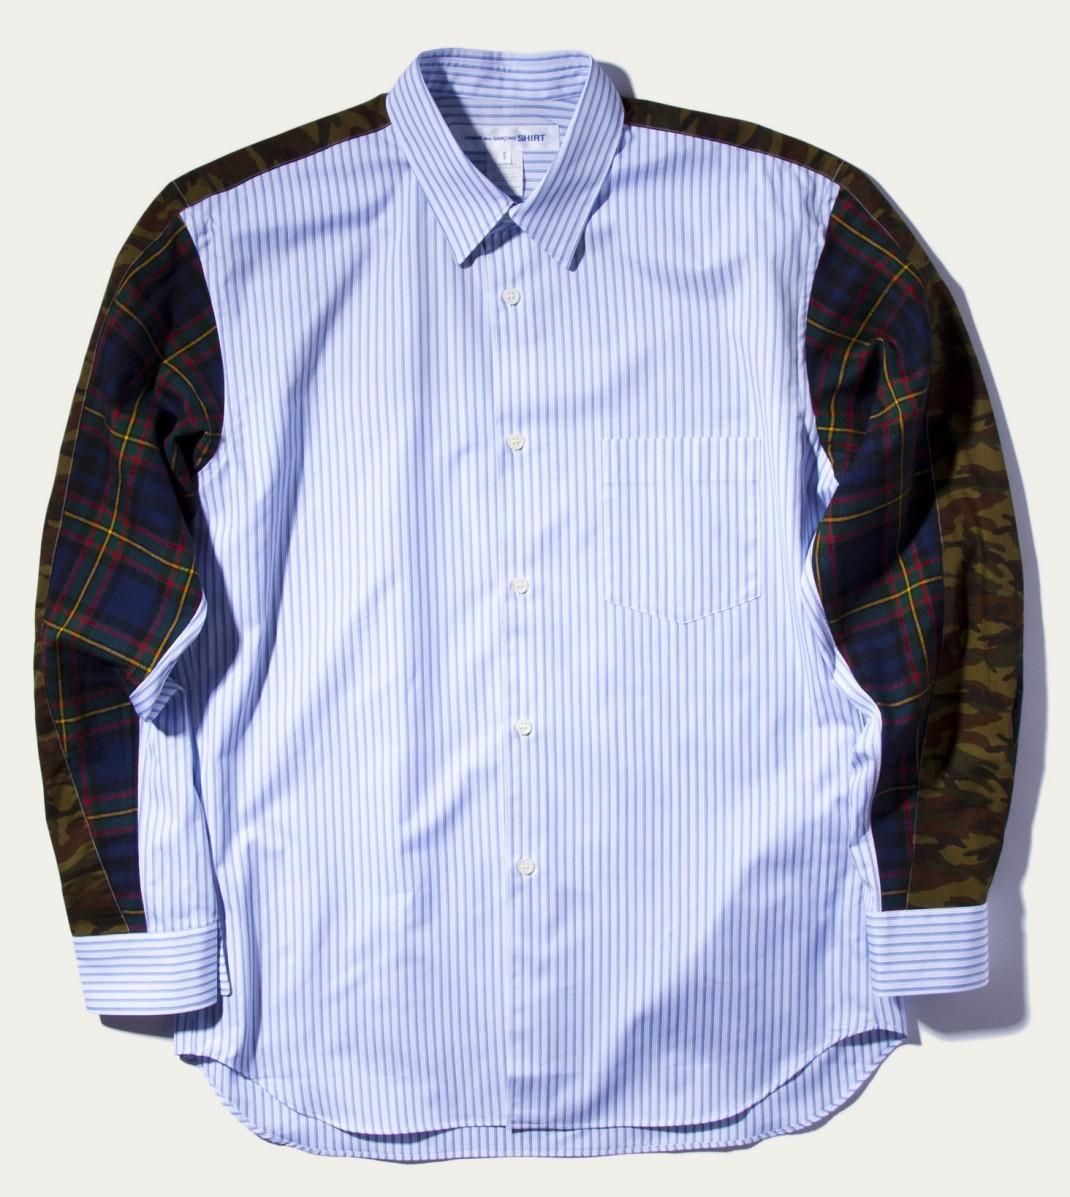 CDG_SHIRT_Mix_Pattern_Stripe_Shirt_03a4541d-8089-4f91-ba5f-601be7edfbd5